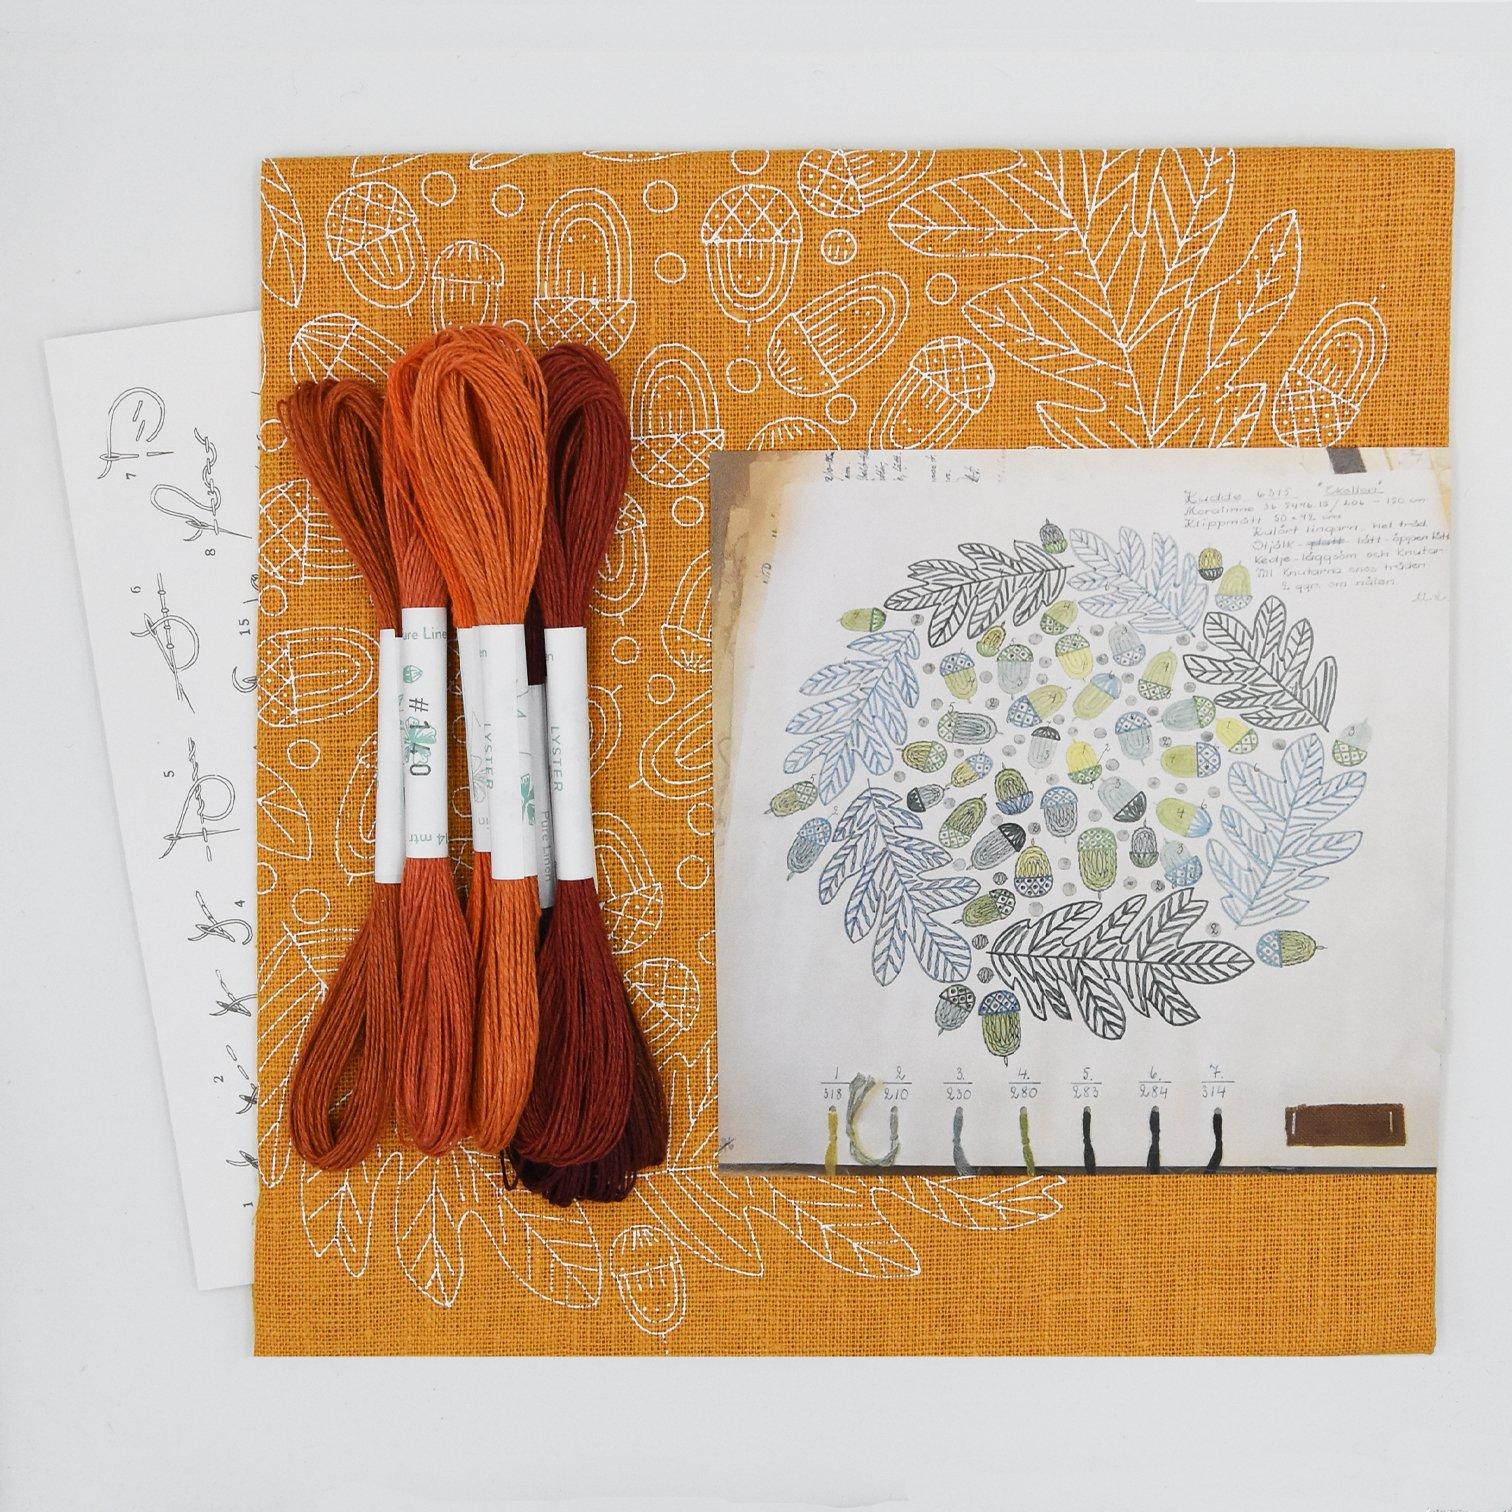 Linladan - Acorn - Swedish Embroidery Kit 25